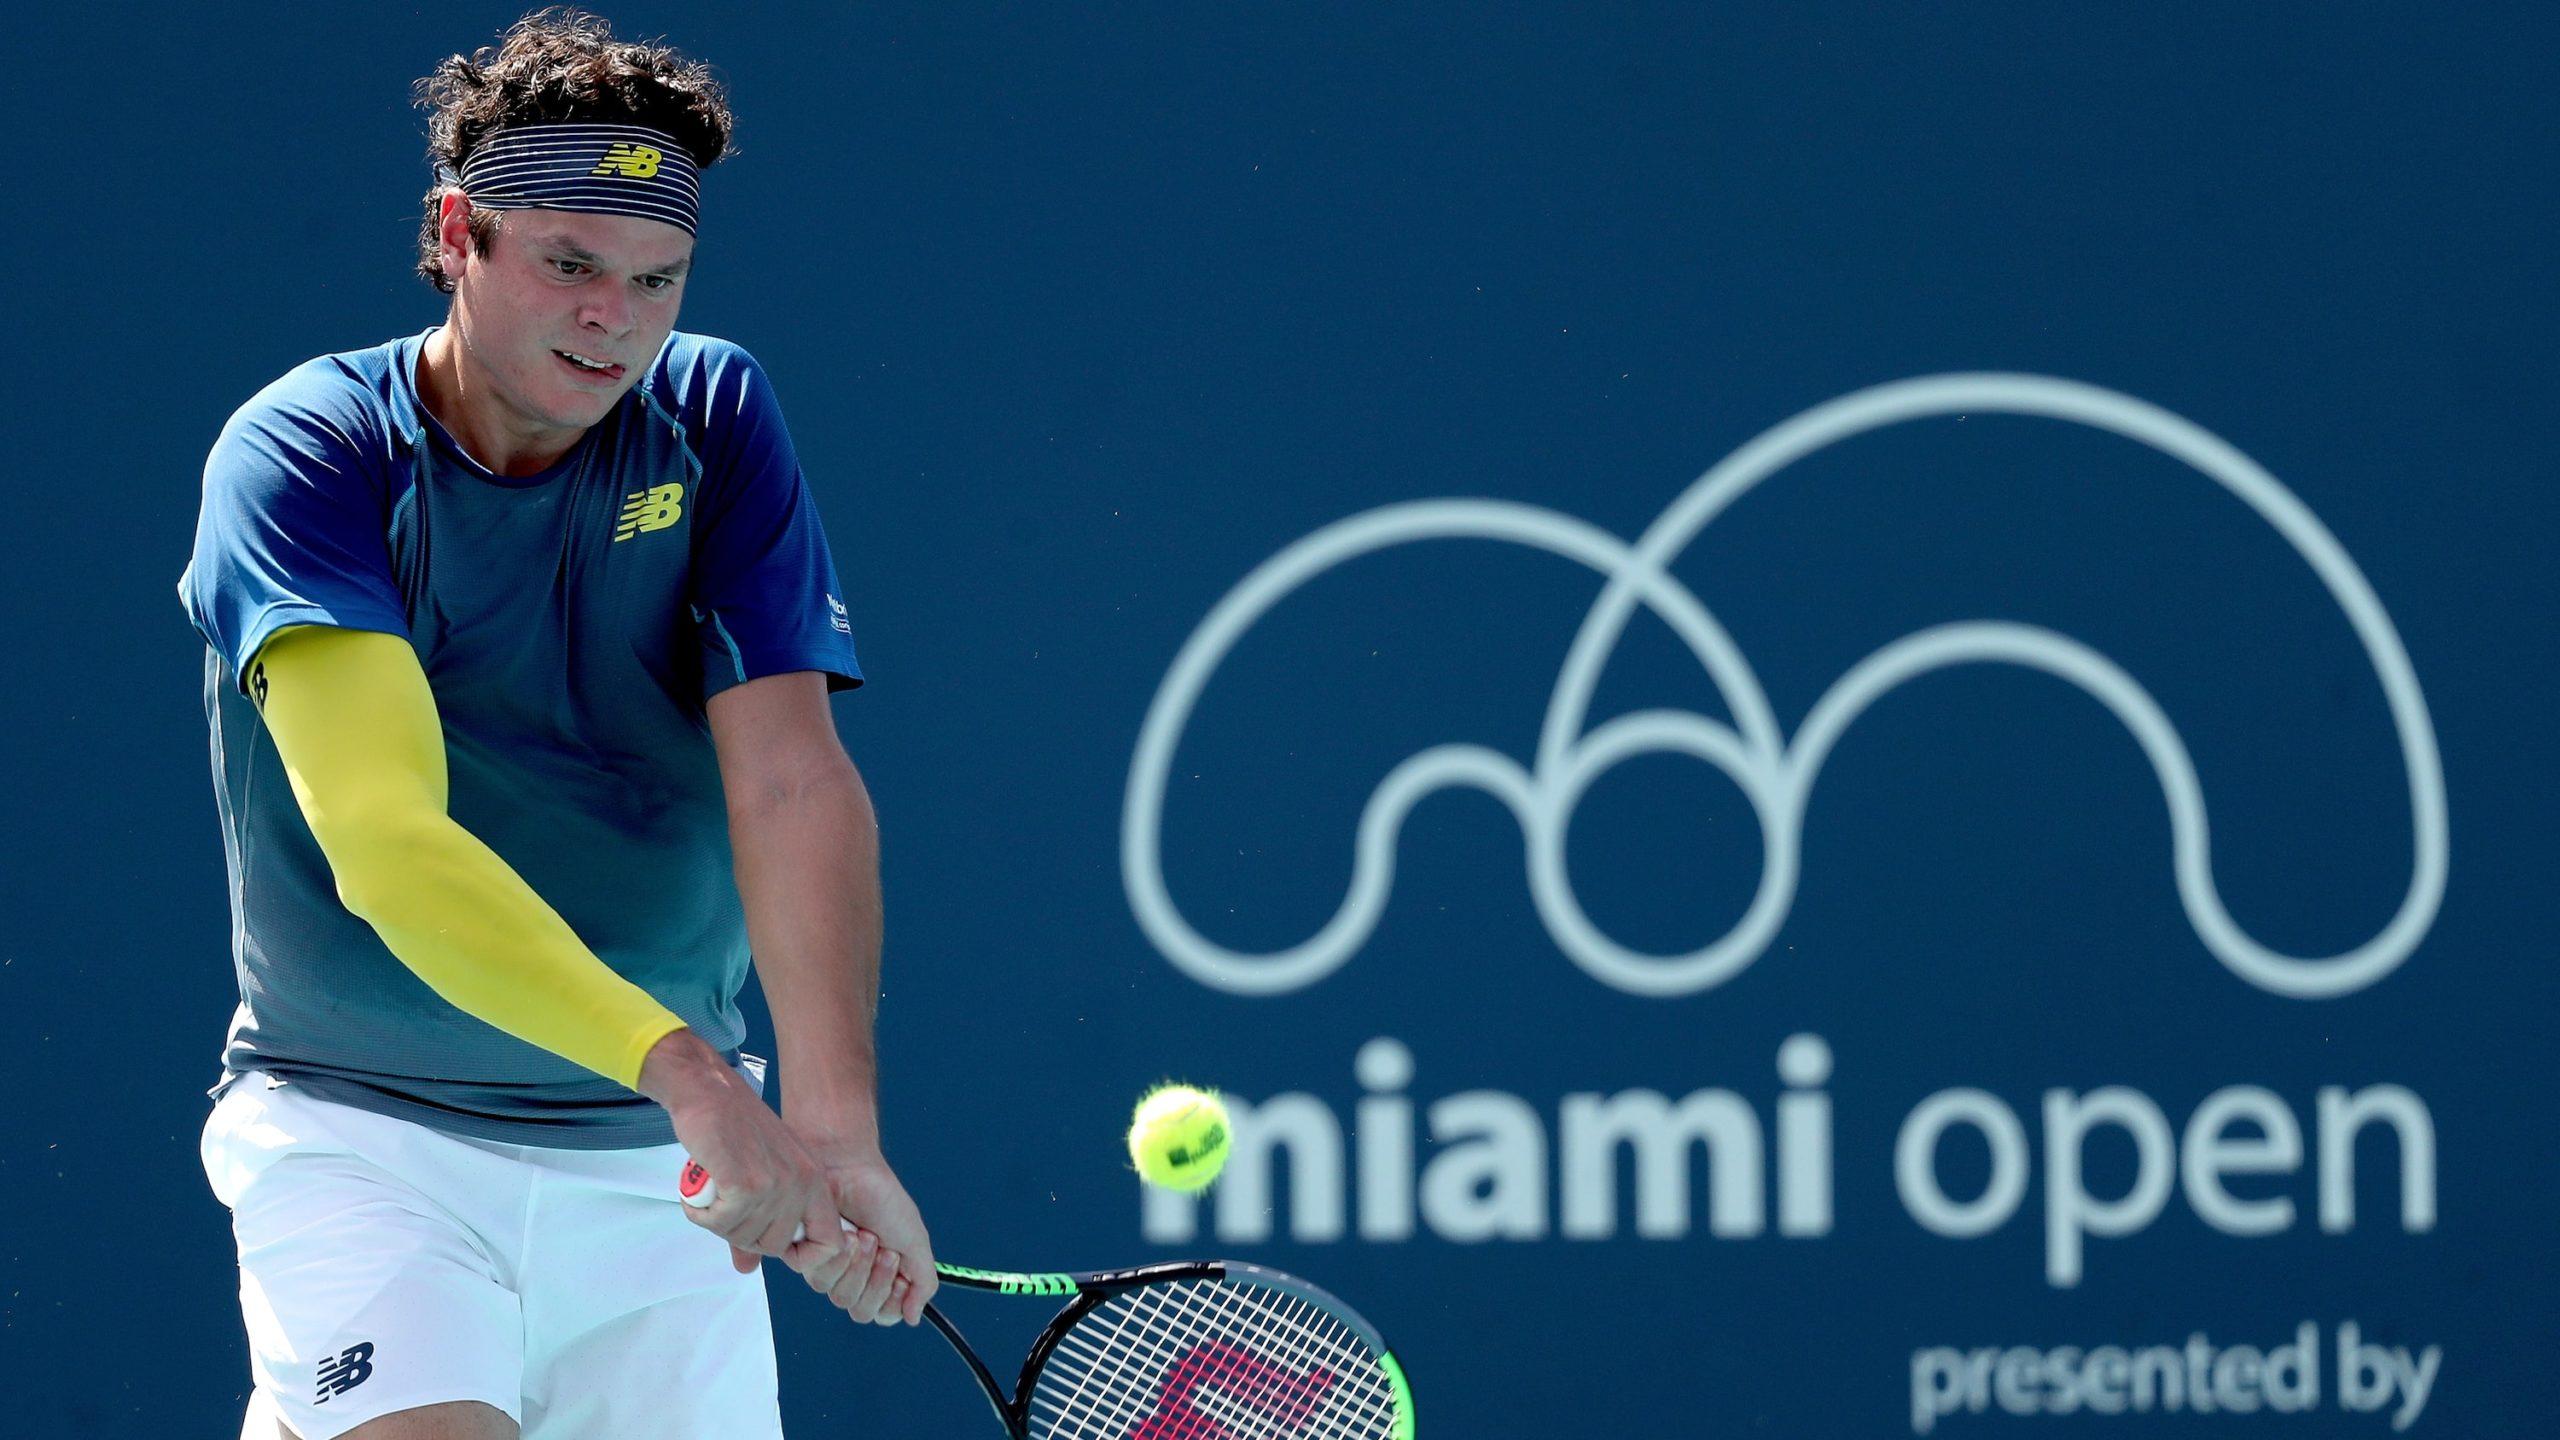 Miami Open 2021: Milos Raonic vs. Hubert Hurkacz Tennis Pick and Prediction